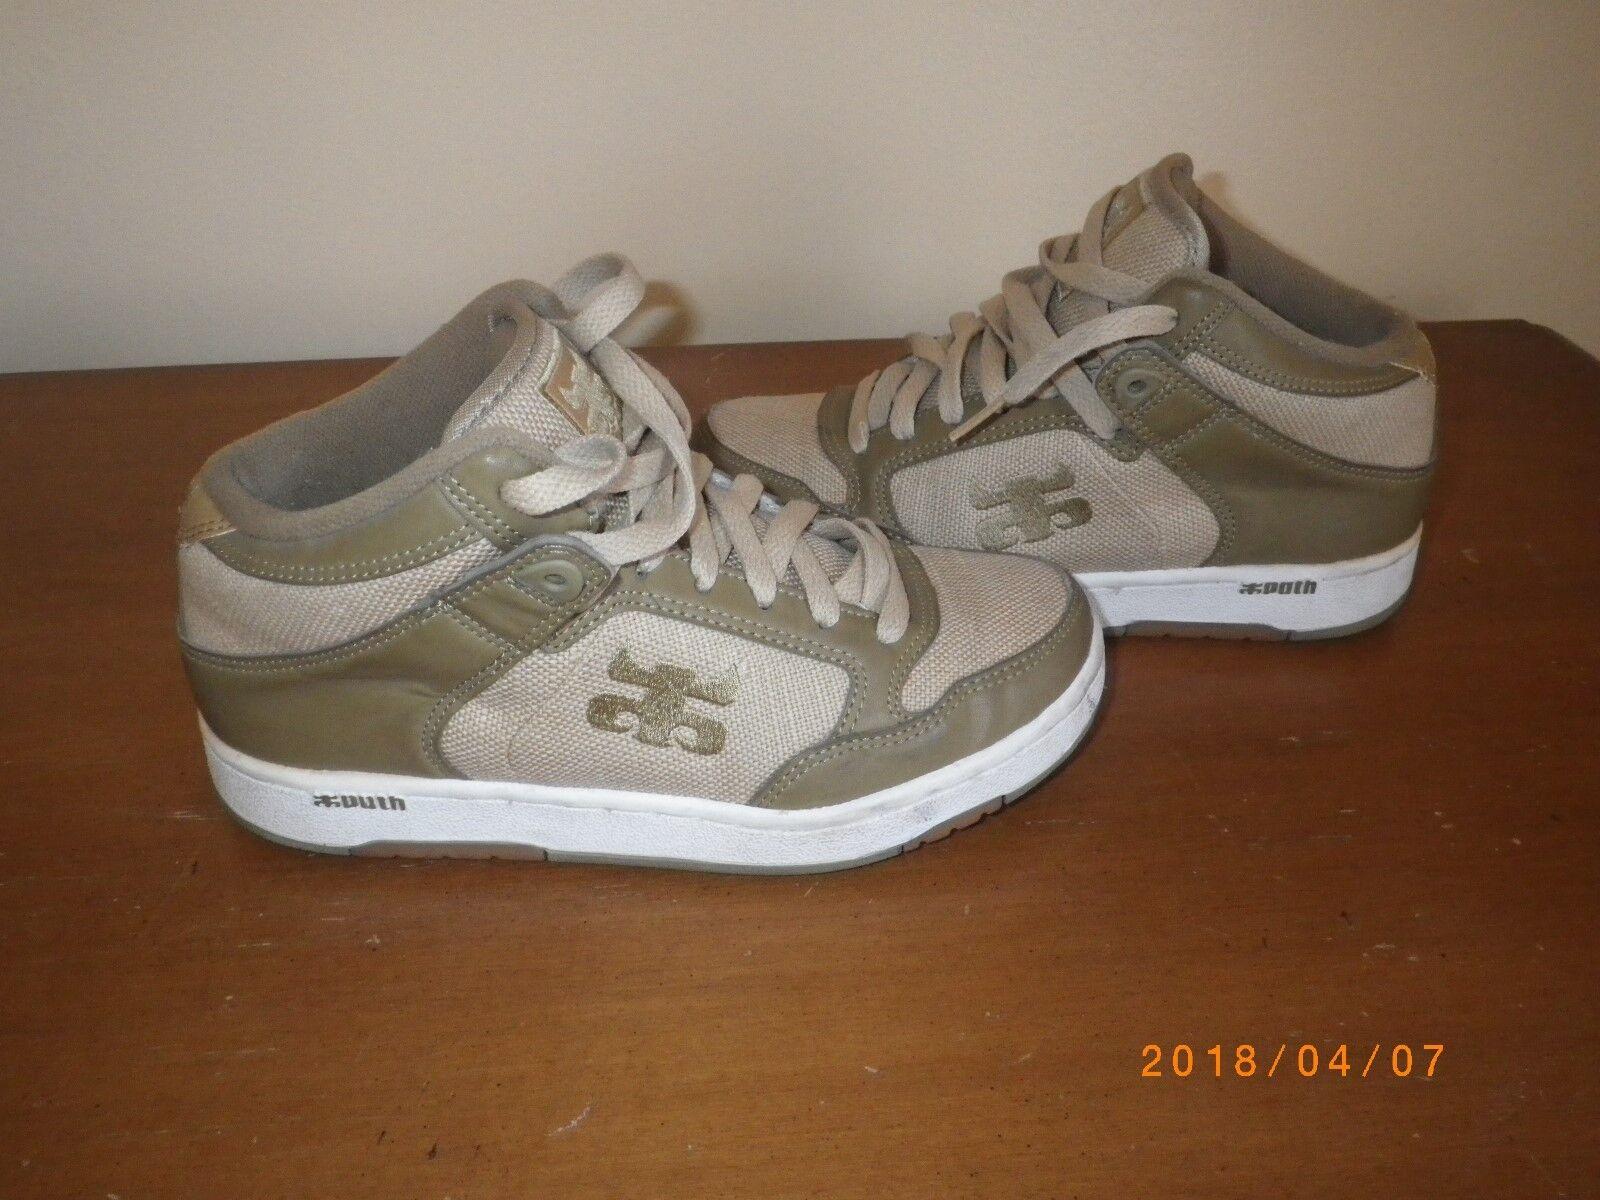 Ipath Oconnor Skate Sneaker Size 5 Mens Boys Keep On Pushing Shoes Stash Pocket